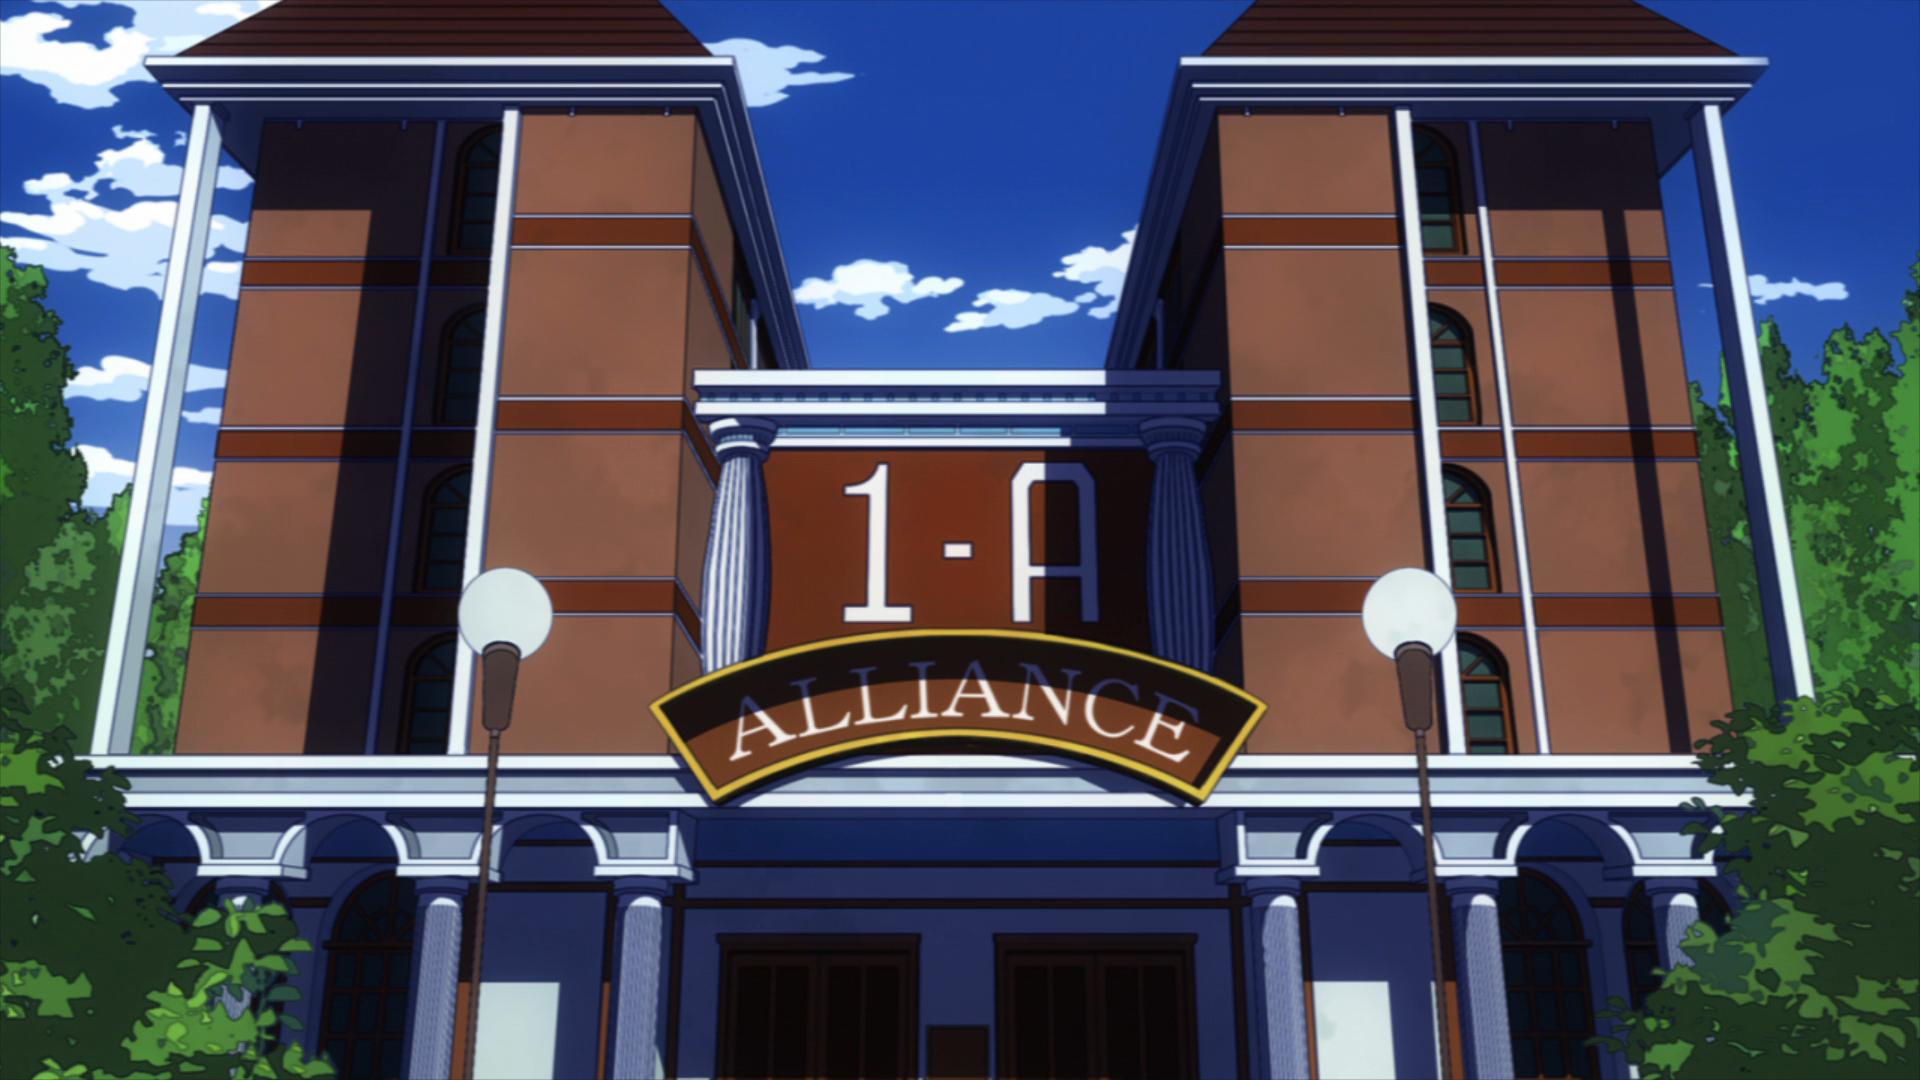 Heights Alliance